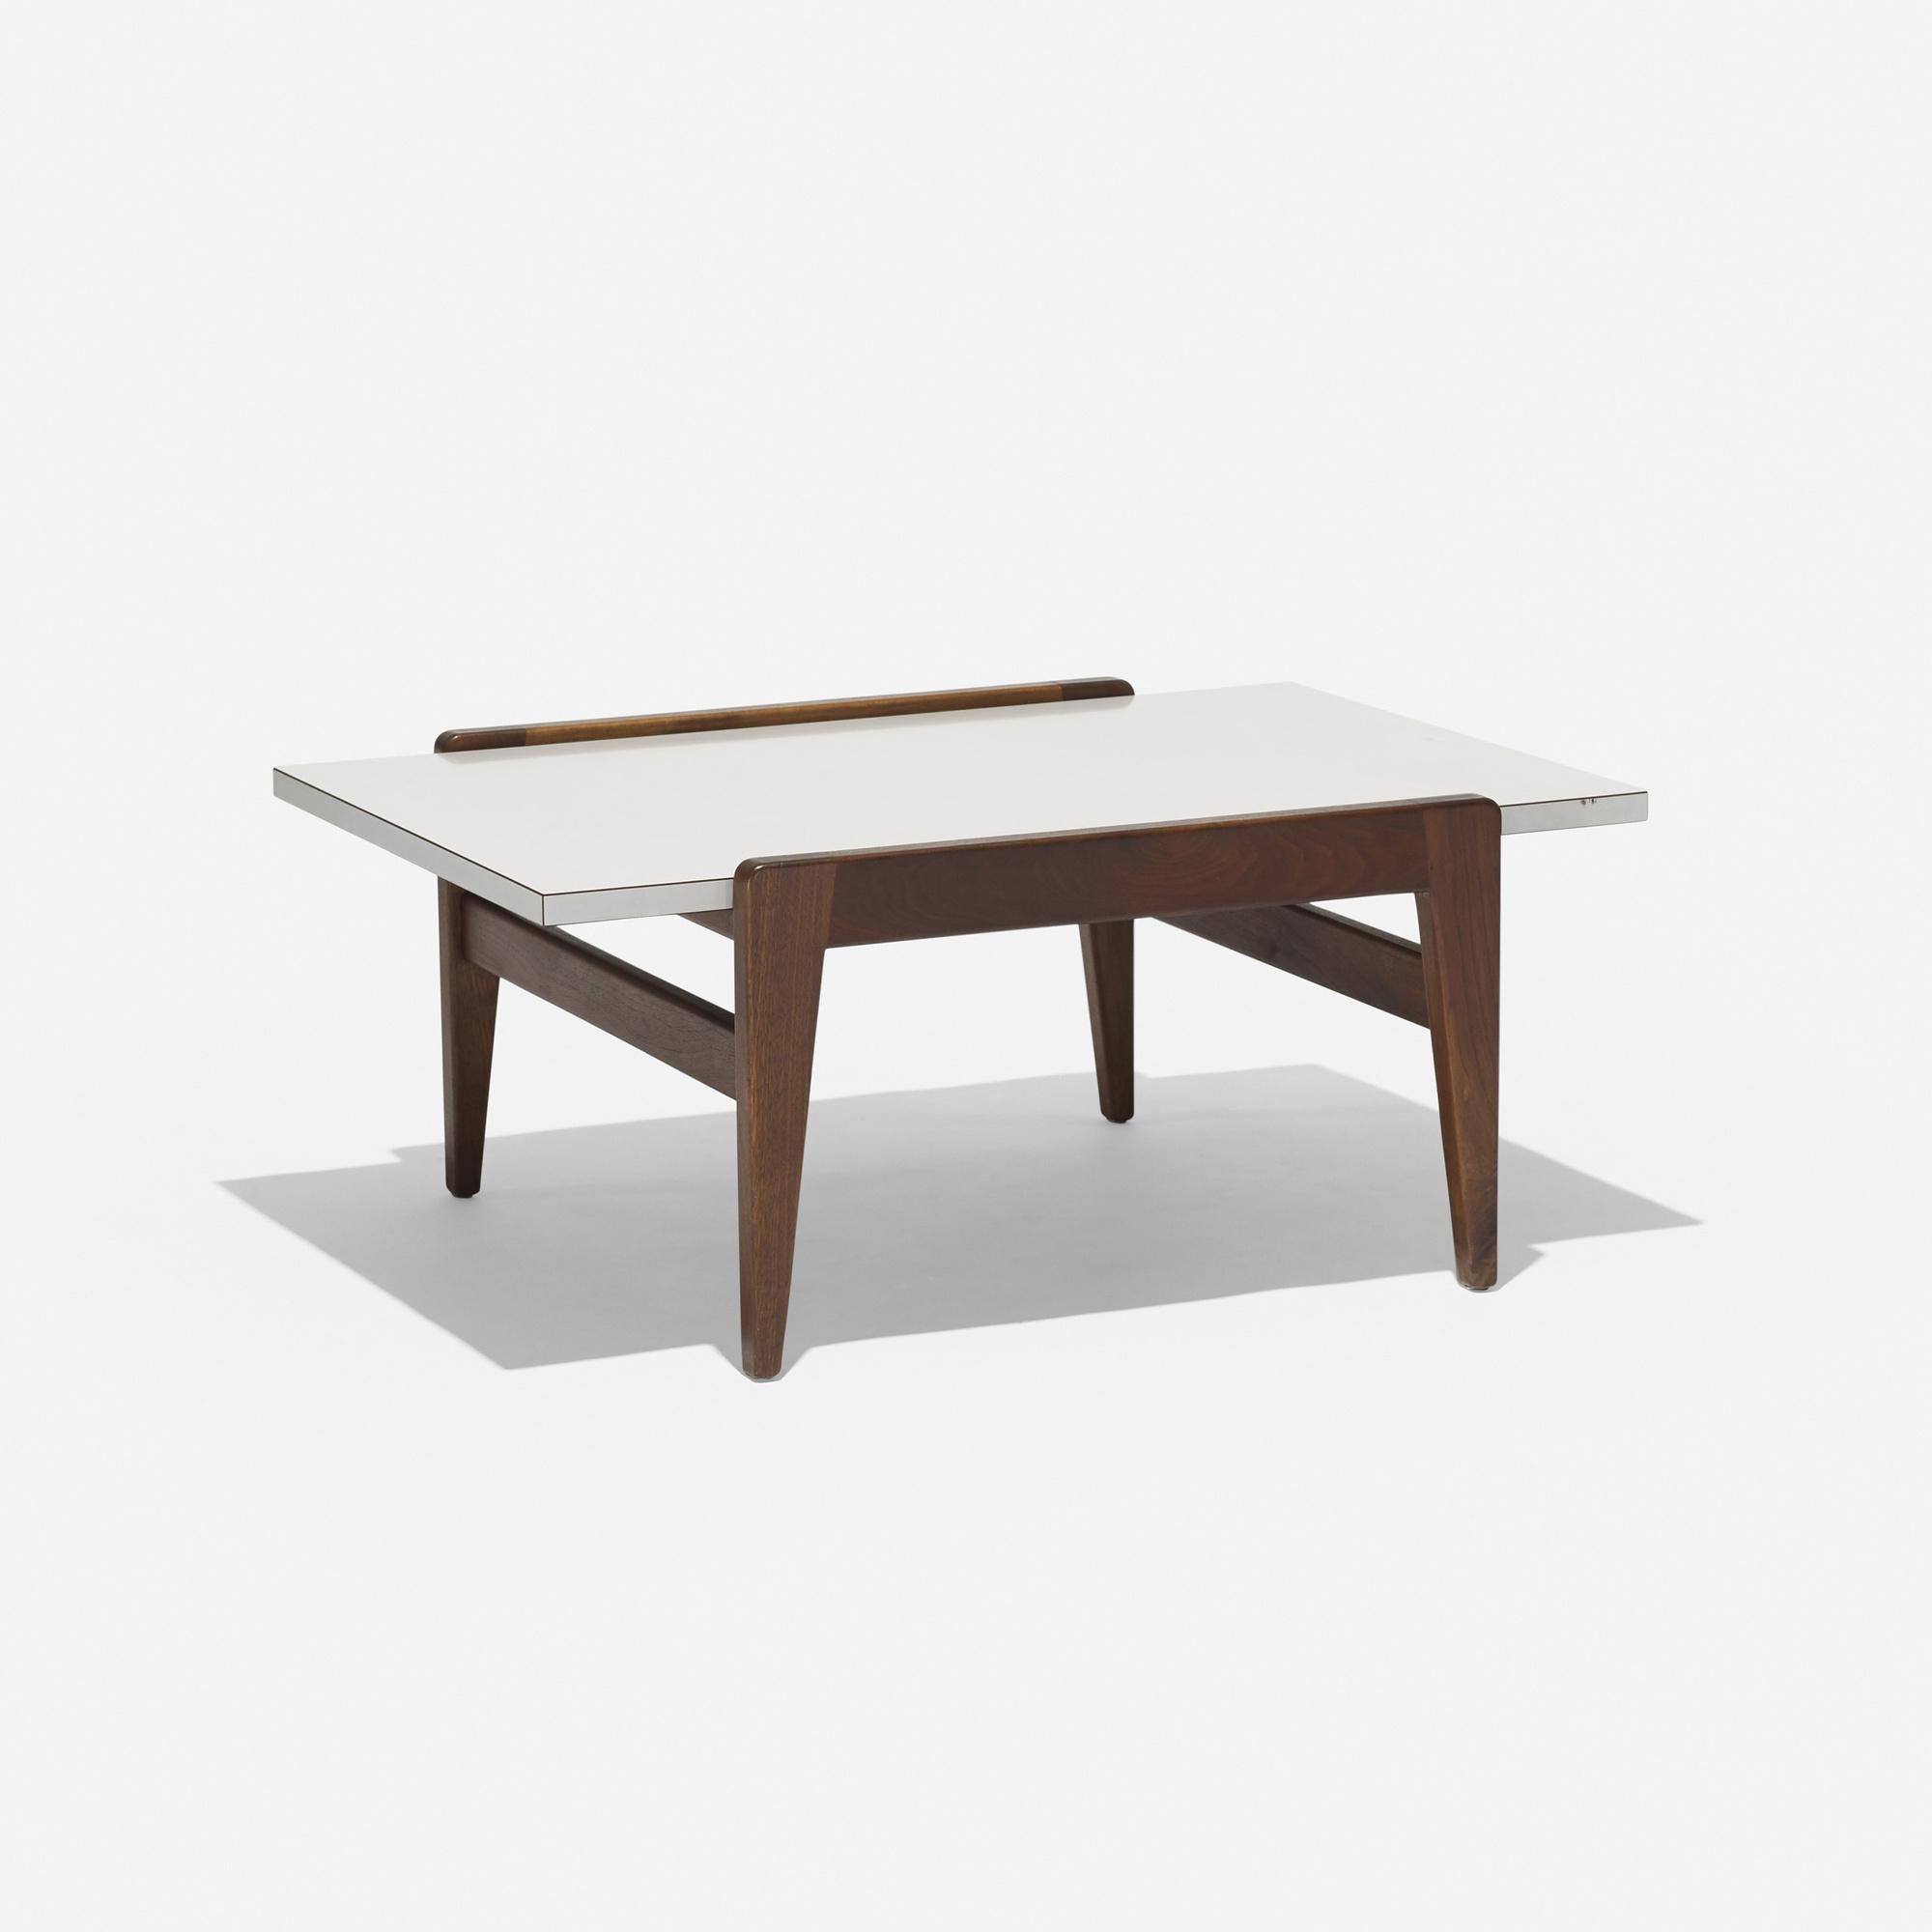 116 jens risom coffee table american design 11 february 2016 116 jens risom coffee table 1 of 3 geotapseo Choice Image